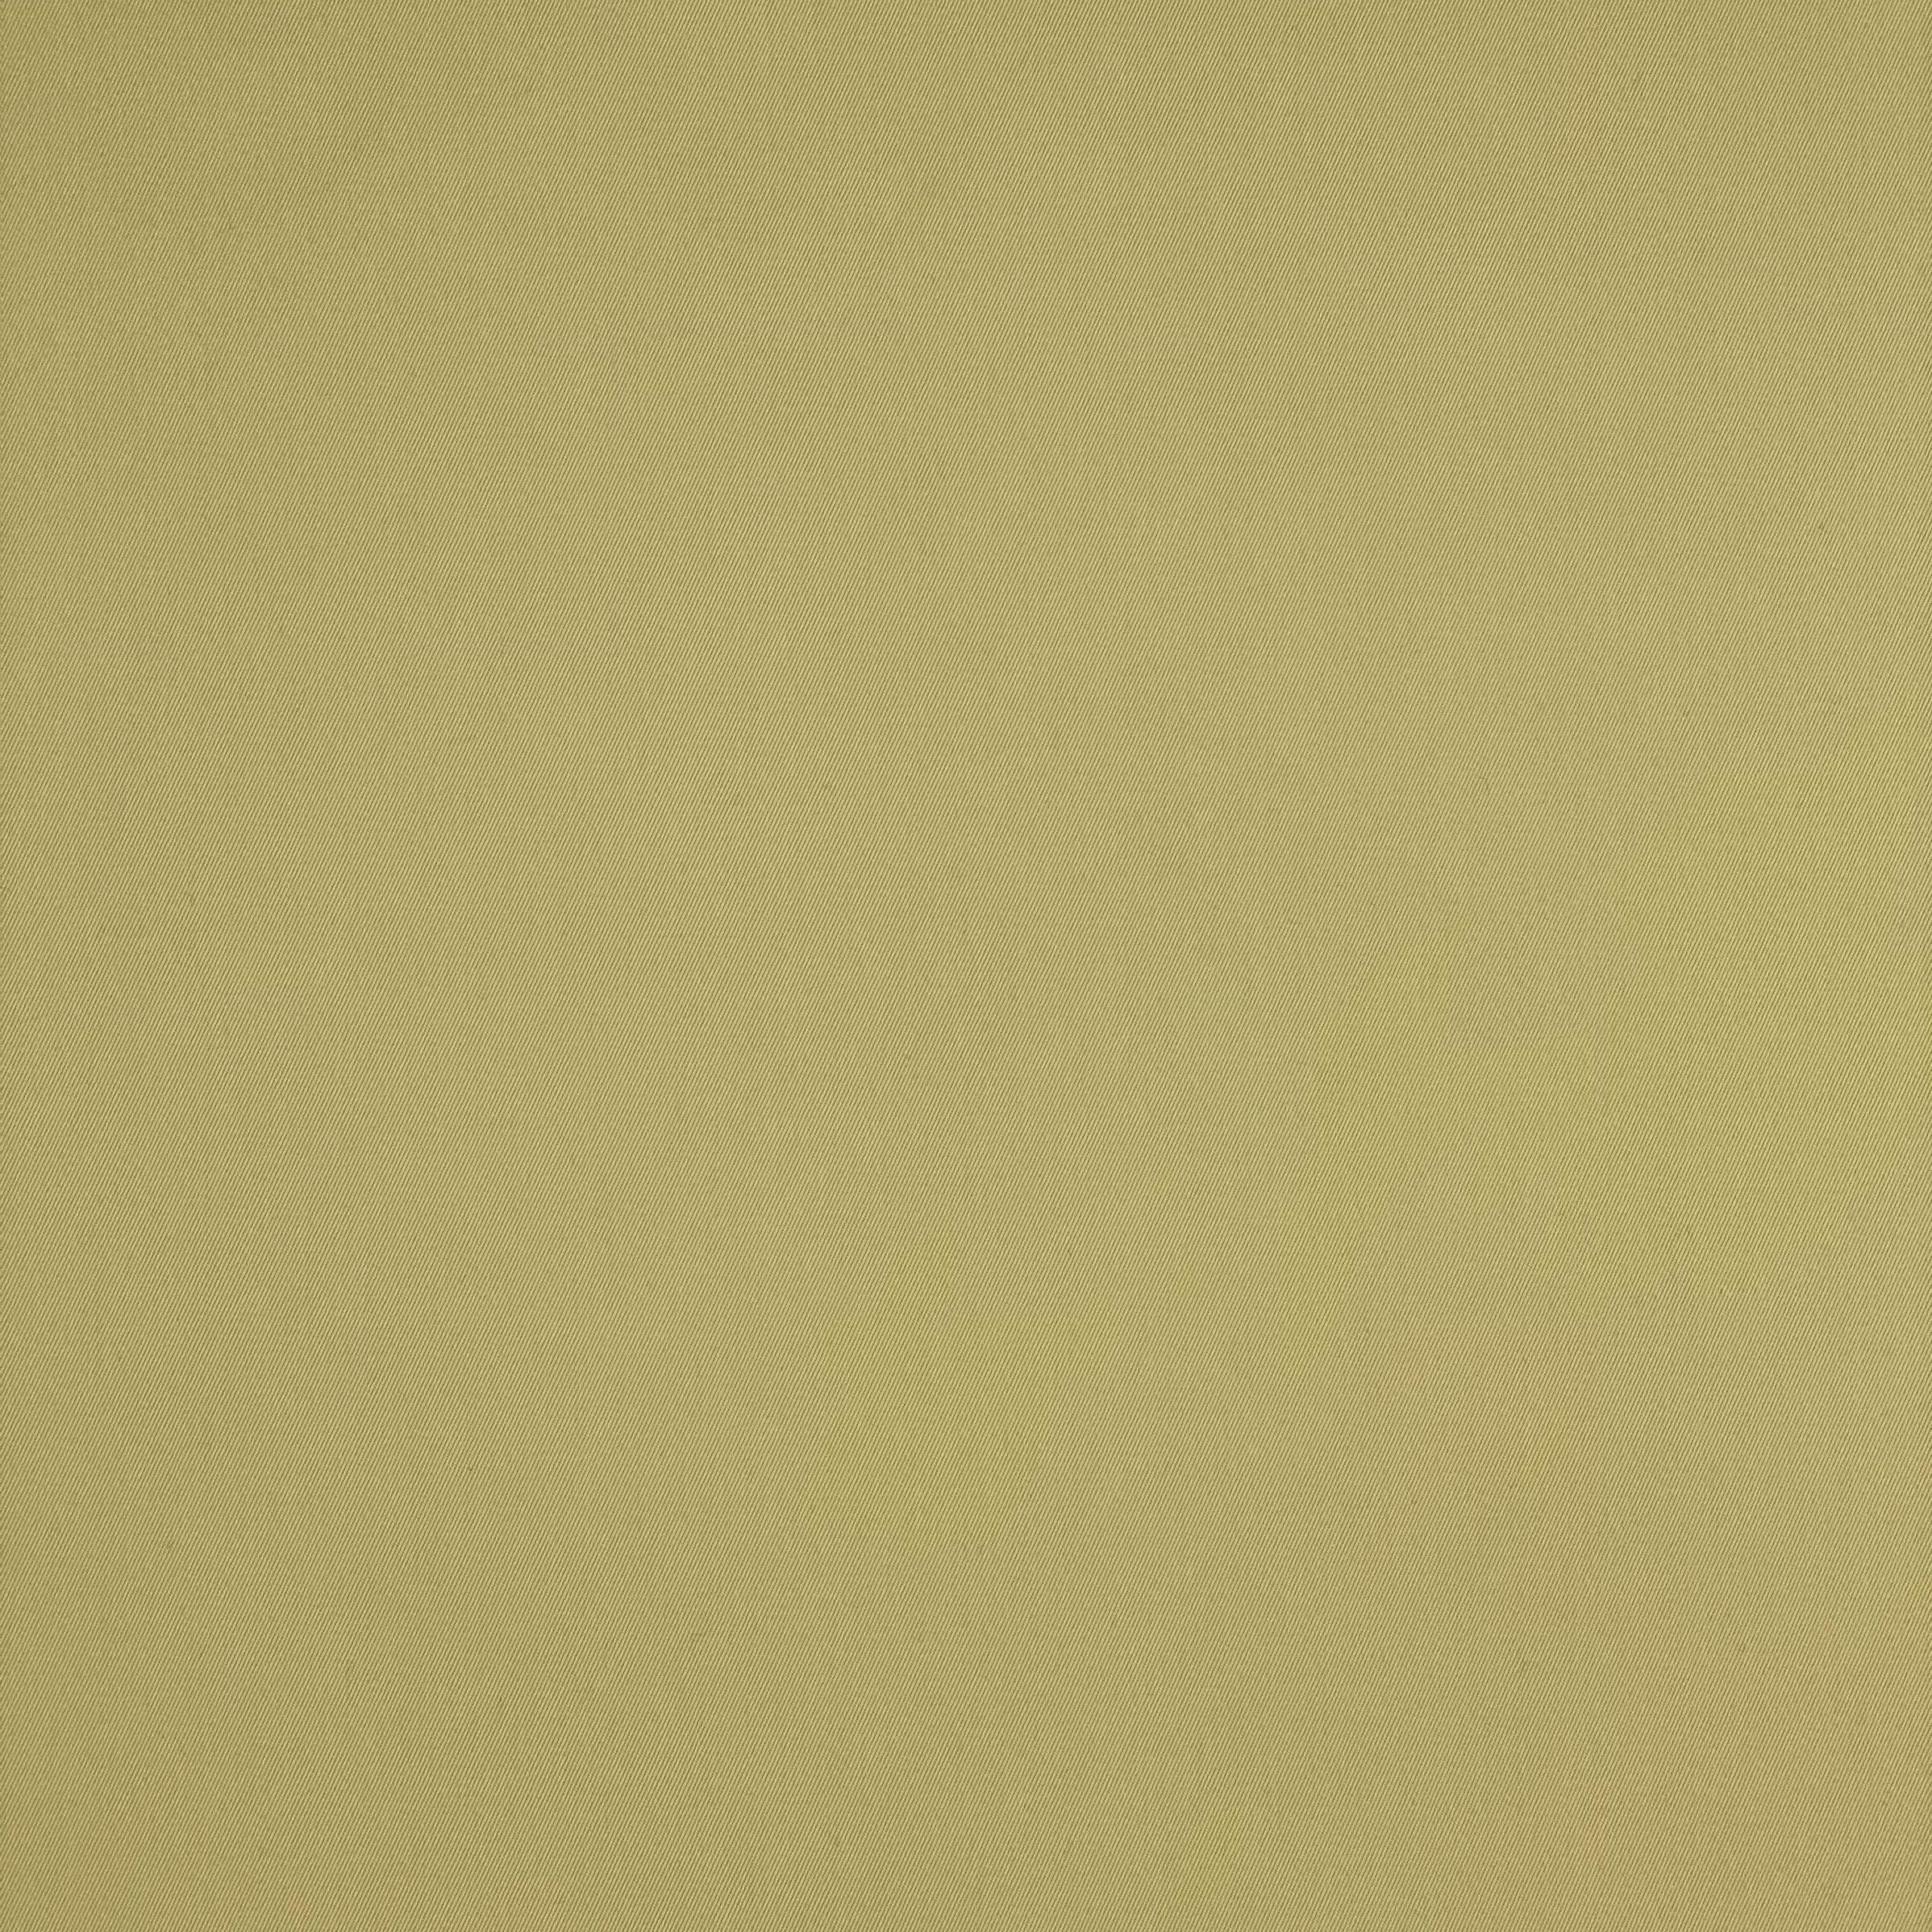 Cotton-Shakespear-Gold-04